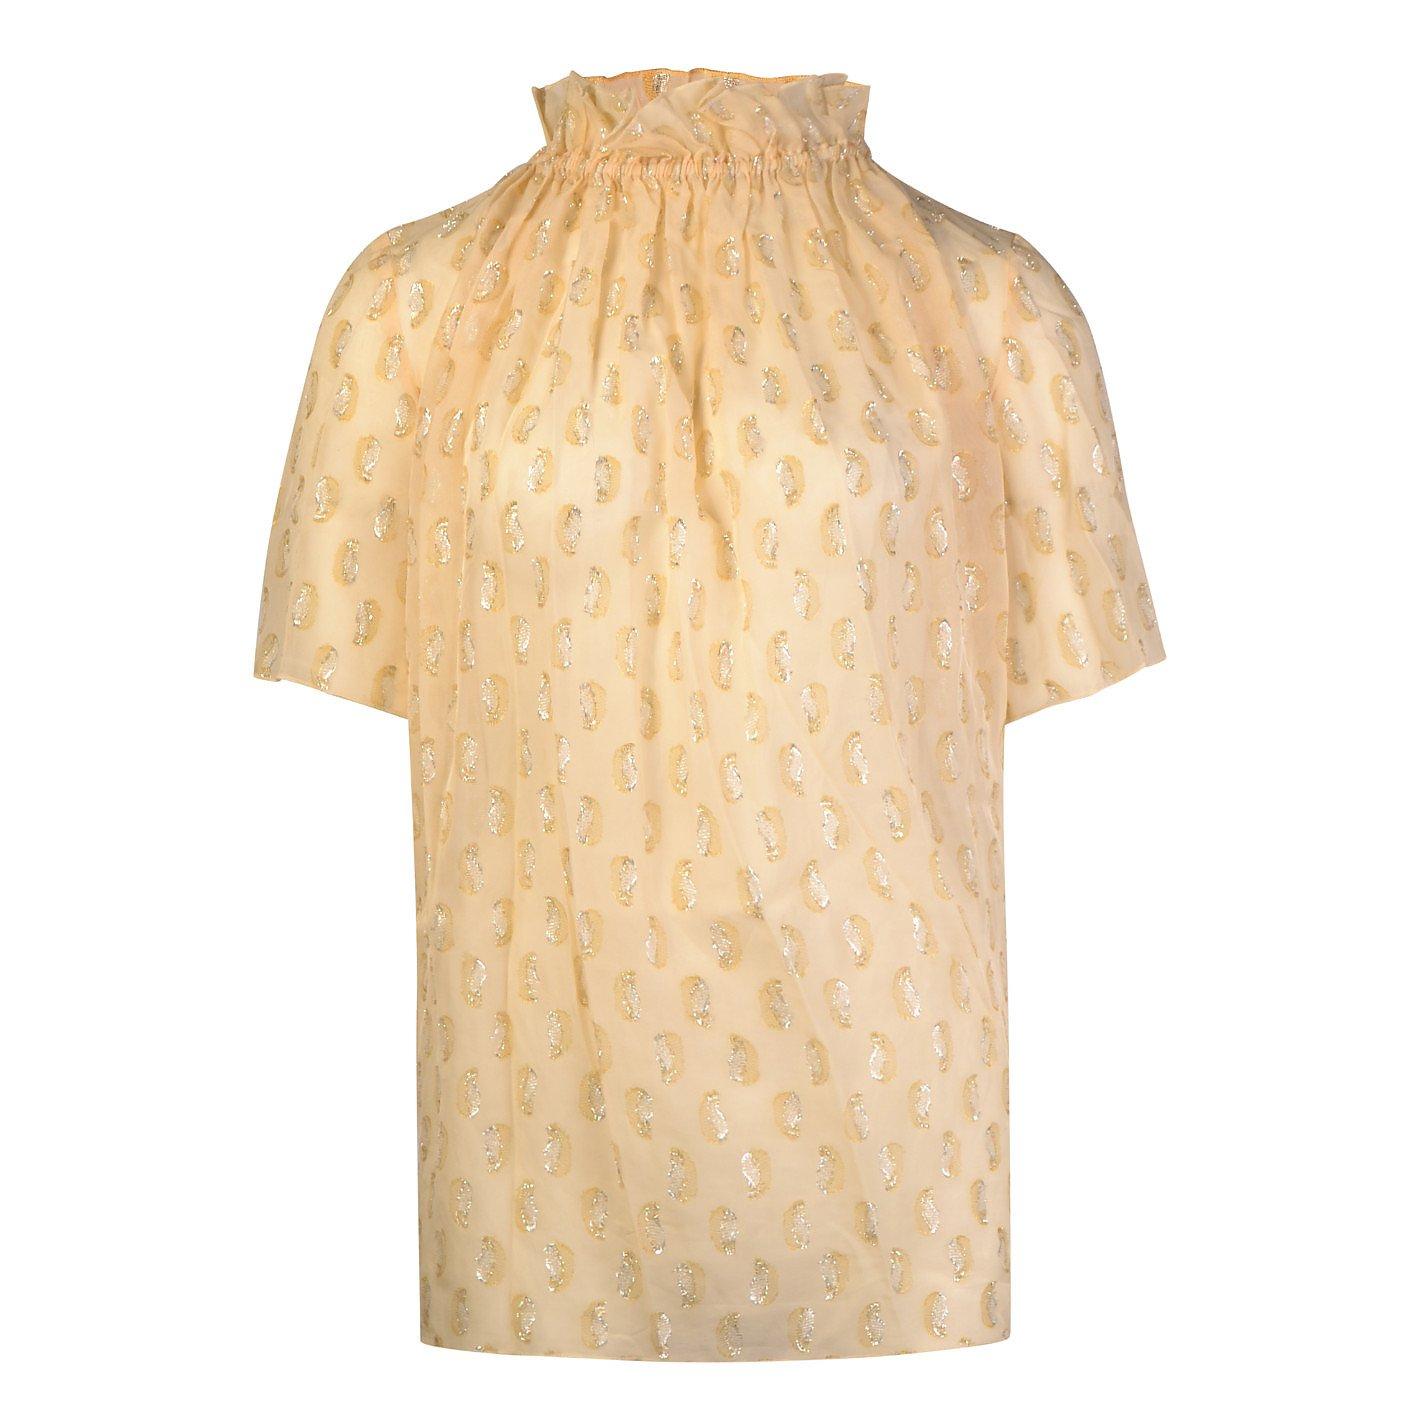 Lovechild 1979 Metallic Fil Coupé Short Sleeve Blouse